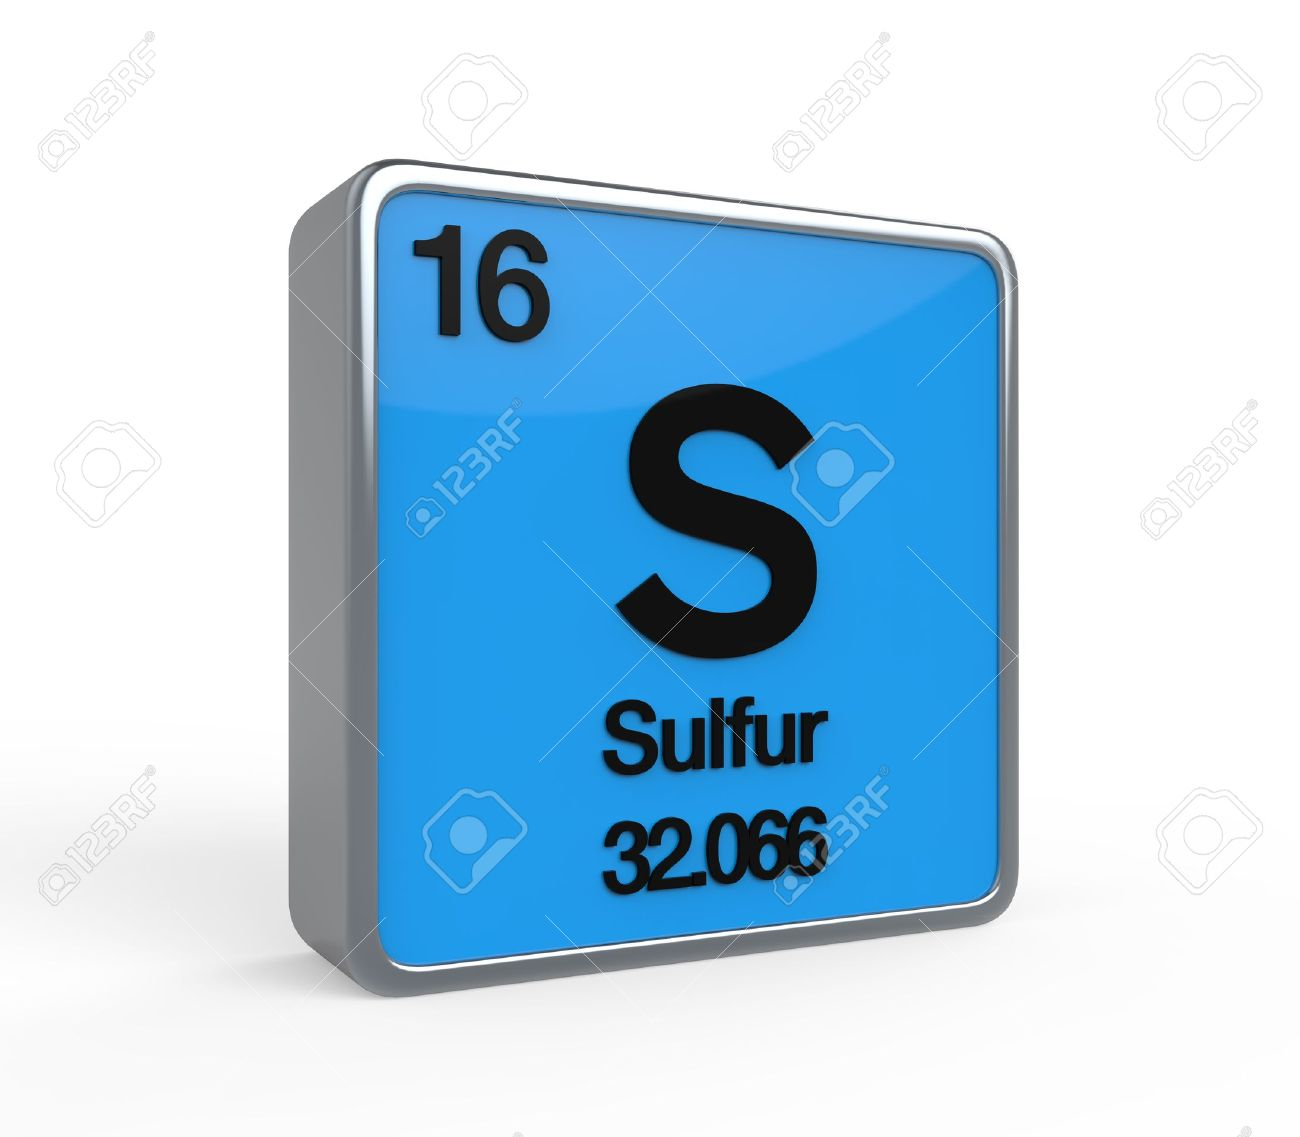 Sulfur element periodic table stock photo picture and royalty sulfur element periodic table stock photo 20533988 buycottarizona Image collections